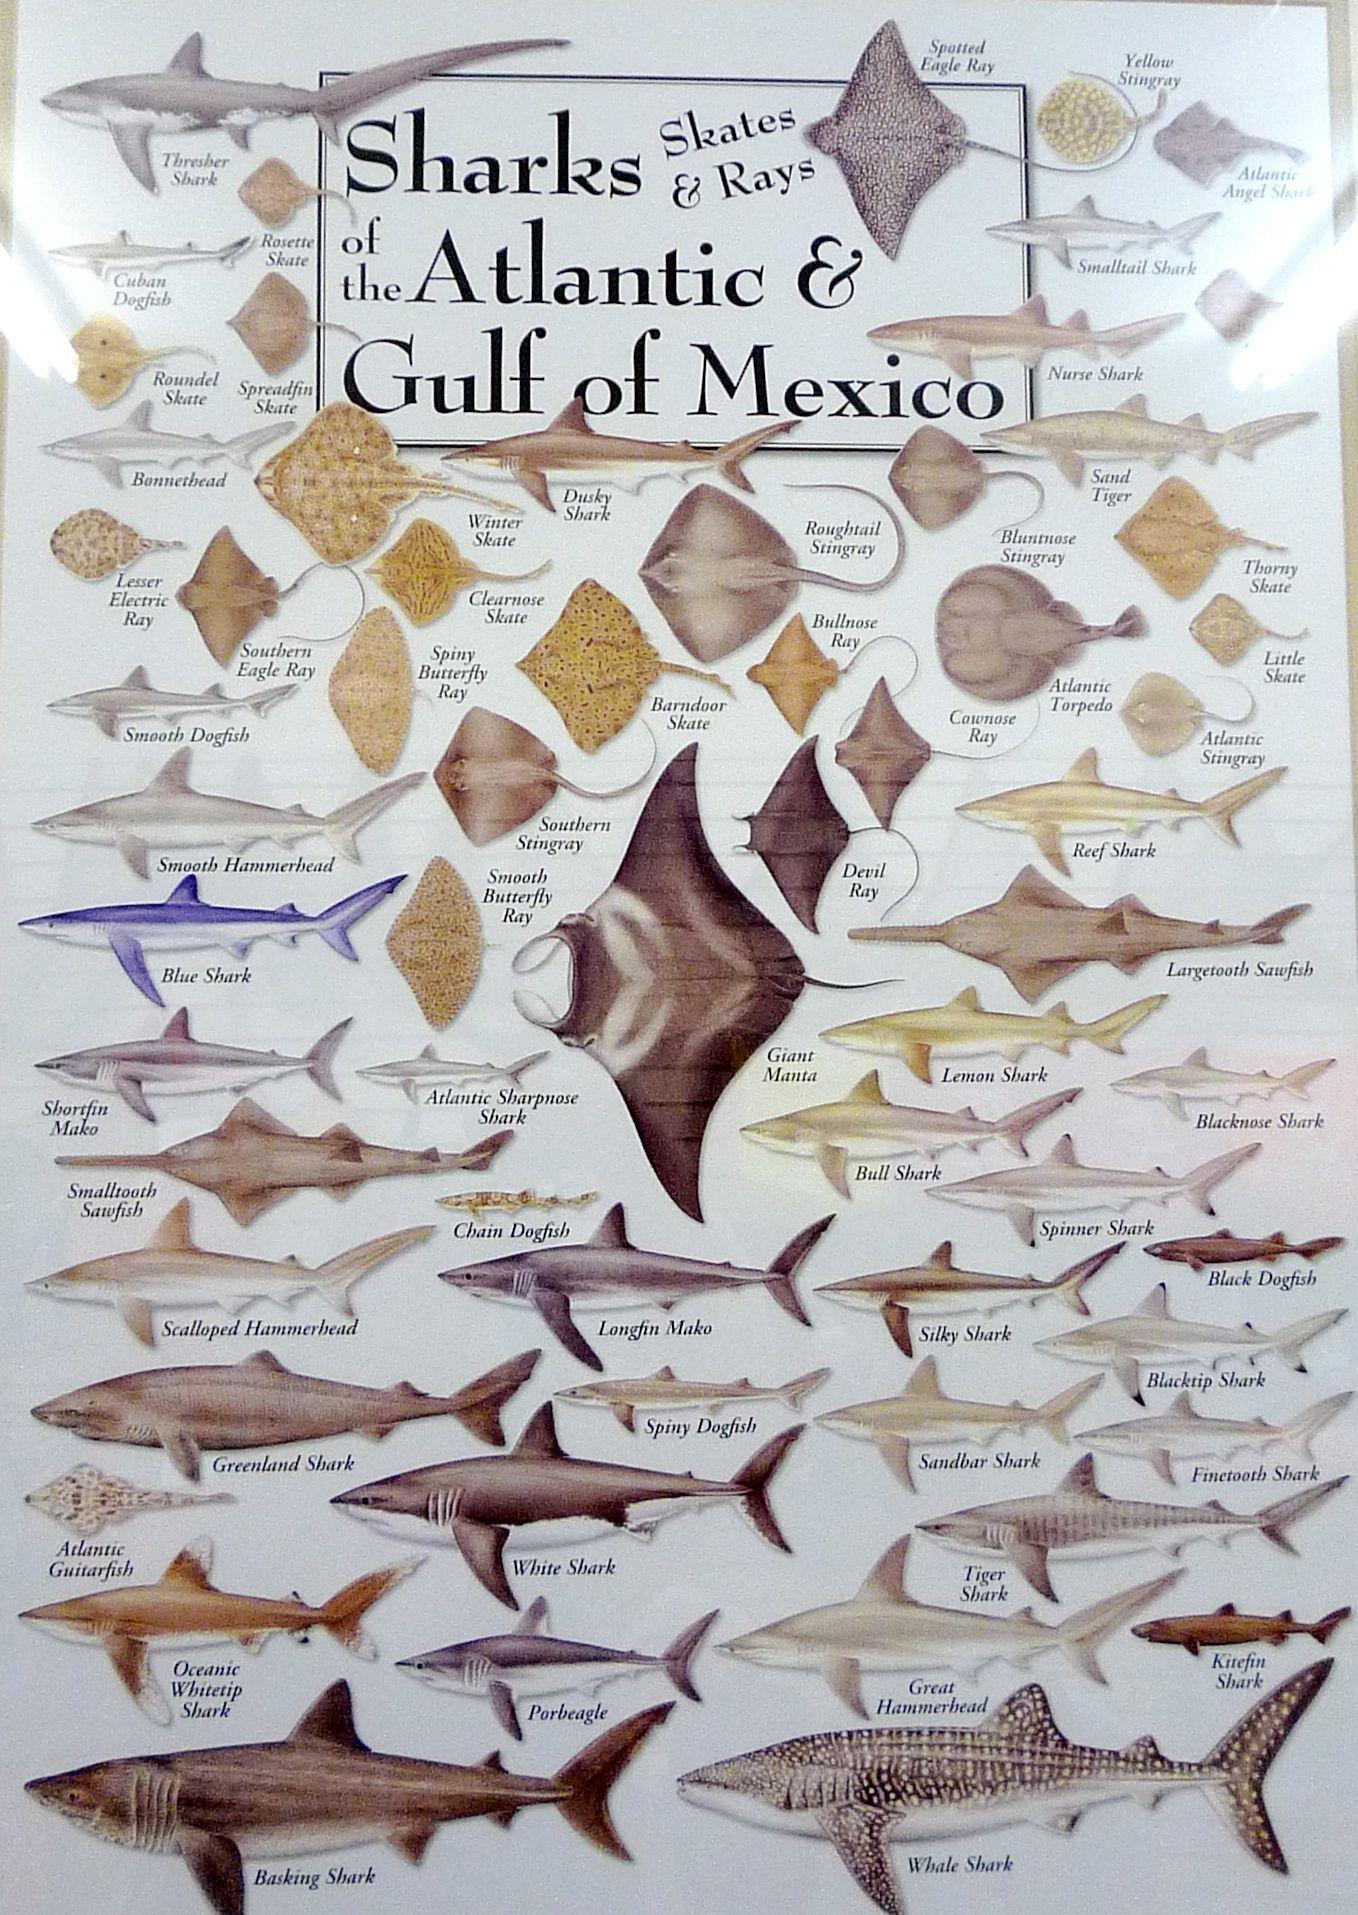 Sharks Of The Atlantic Gulf Of Mexico Shauna Vi Fit Network Vi Fit Network Lee Lange Art Church Fish Chart Sea Fish Shark Fishing